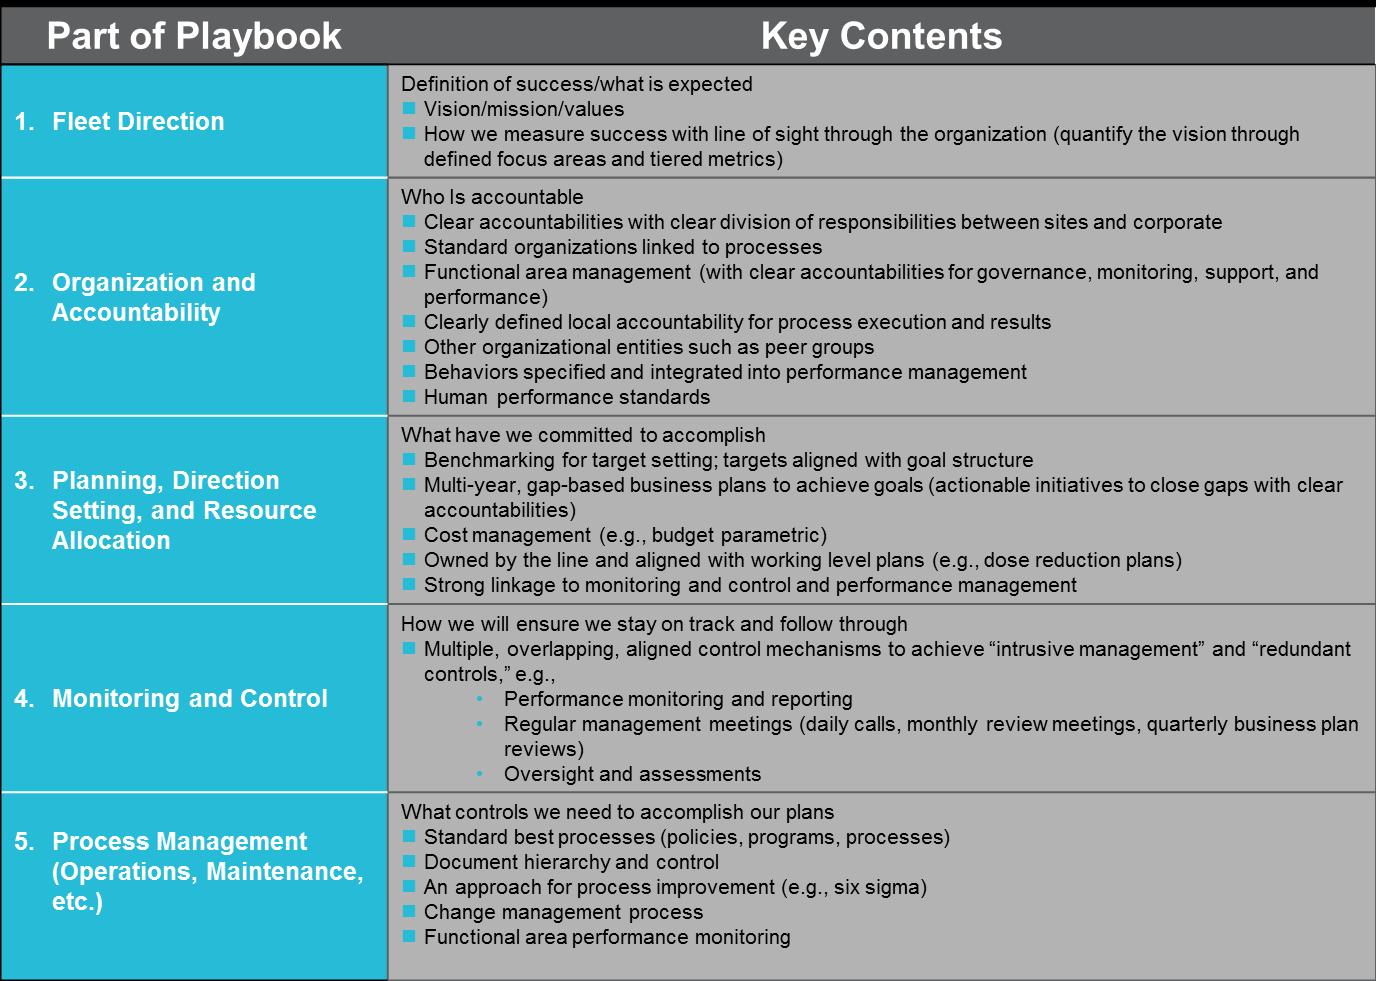 Management Model/Playbook Implementation and Development | ScottMadden